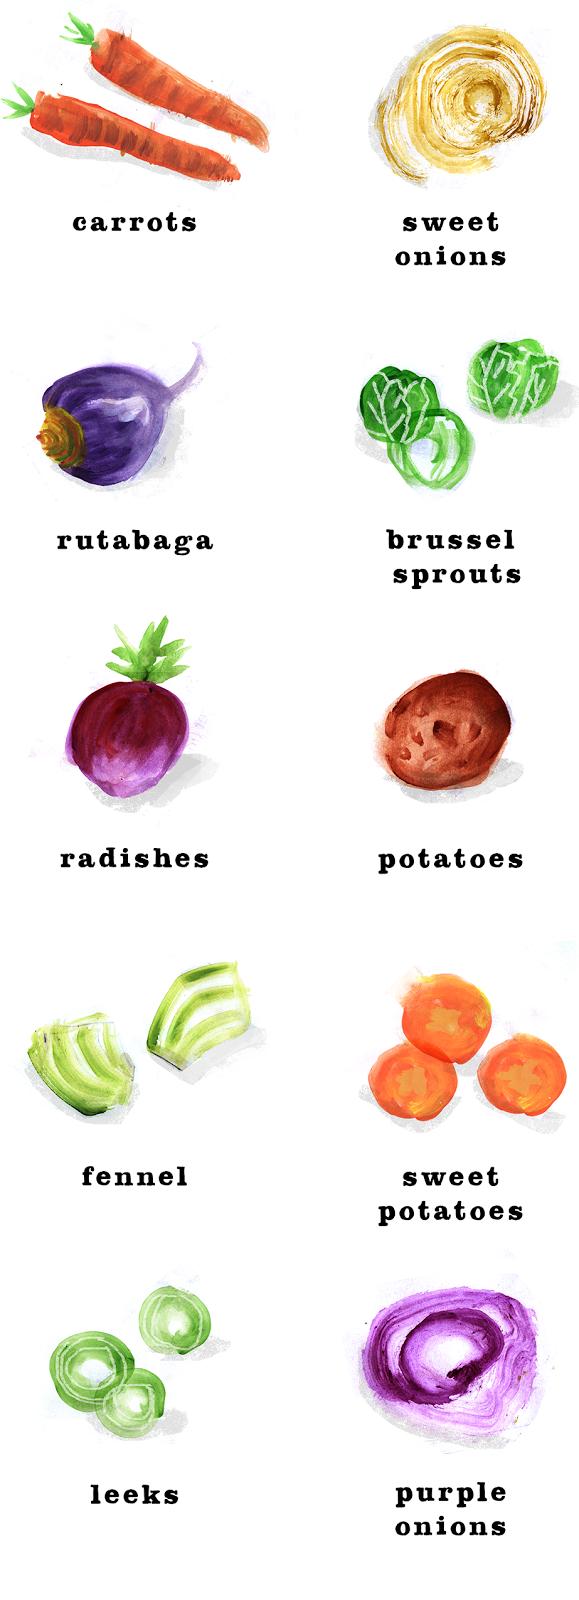 Thomas Keller's One Pot Chicken Recipe, Lauren Monaco Illustration